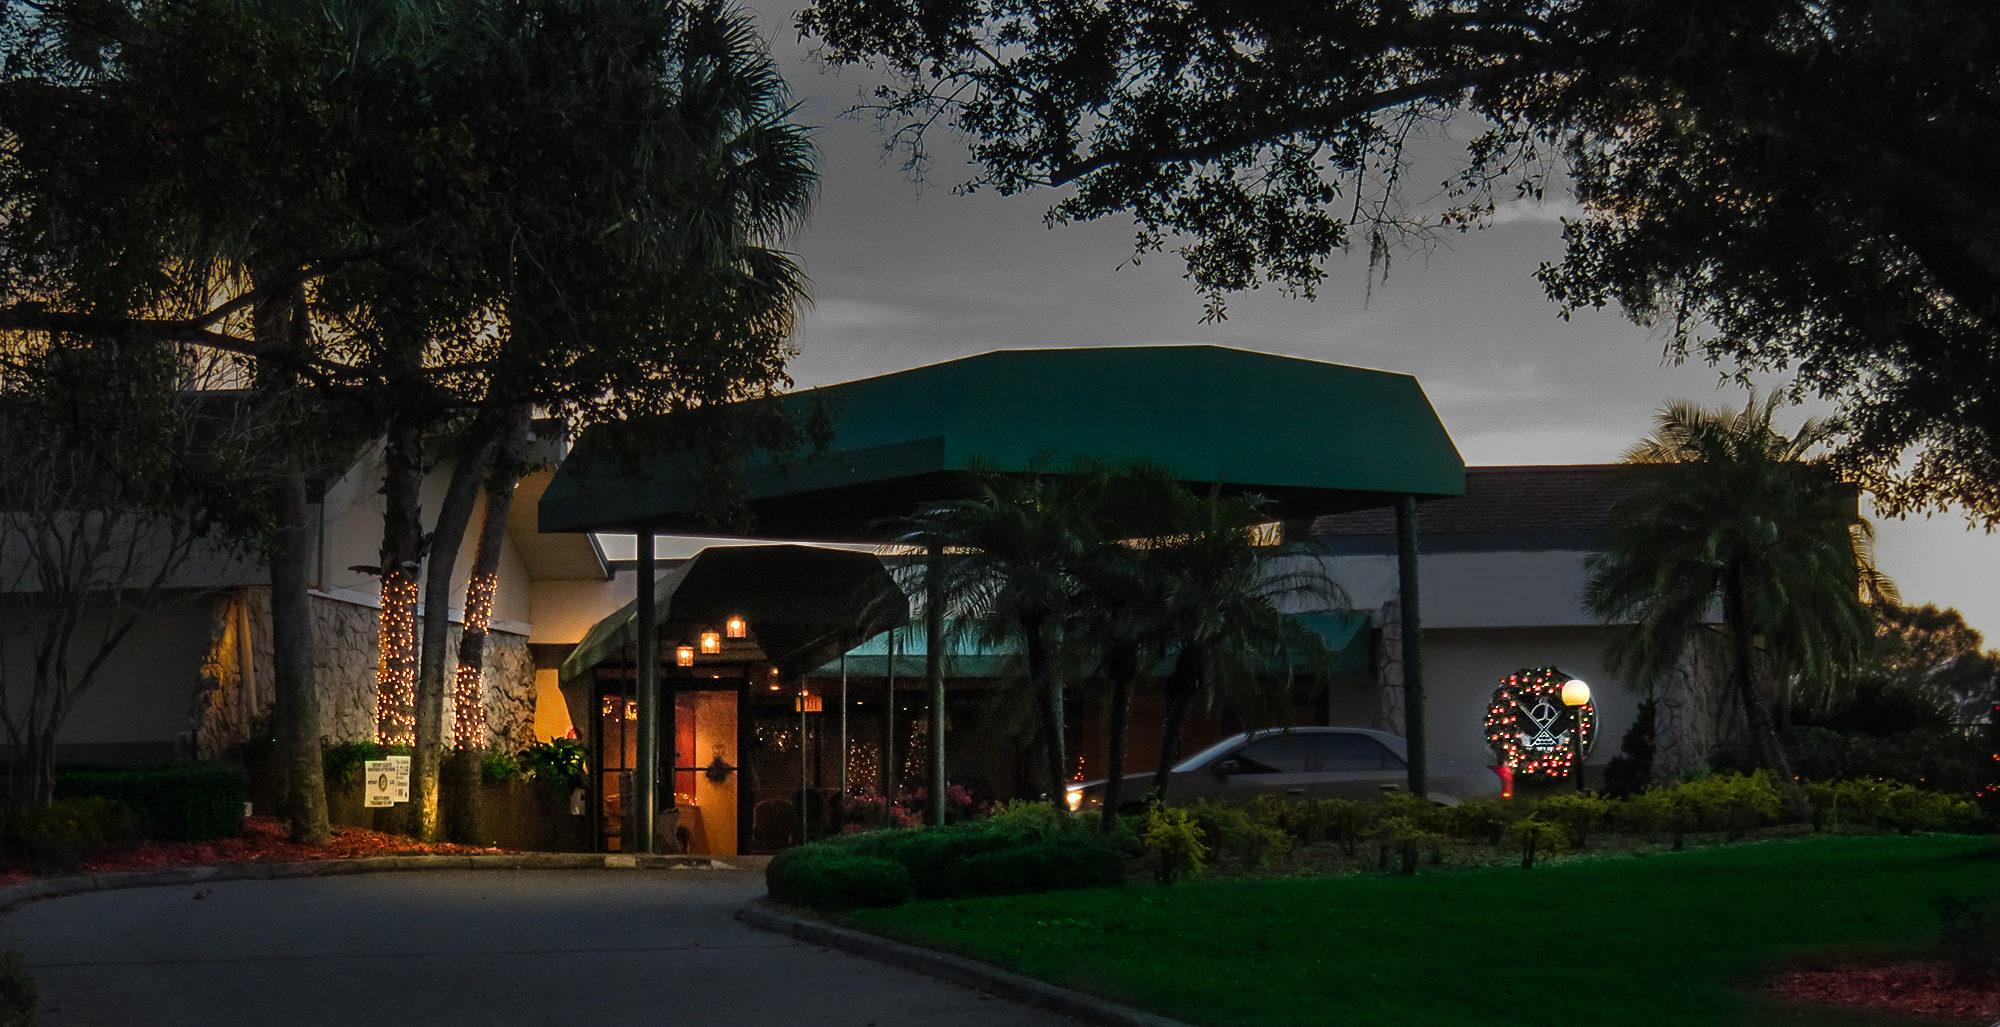 Dec 29, 2016 - Sandpiper Grille front door valet entrance Sun City Center, FL/suncitycenterphotos.com